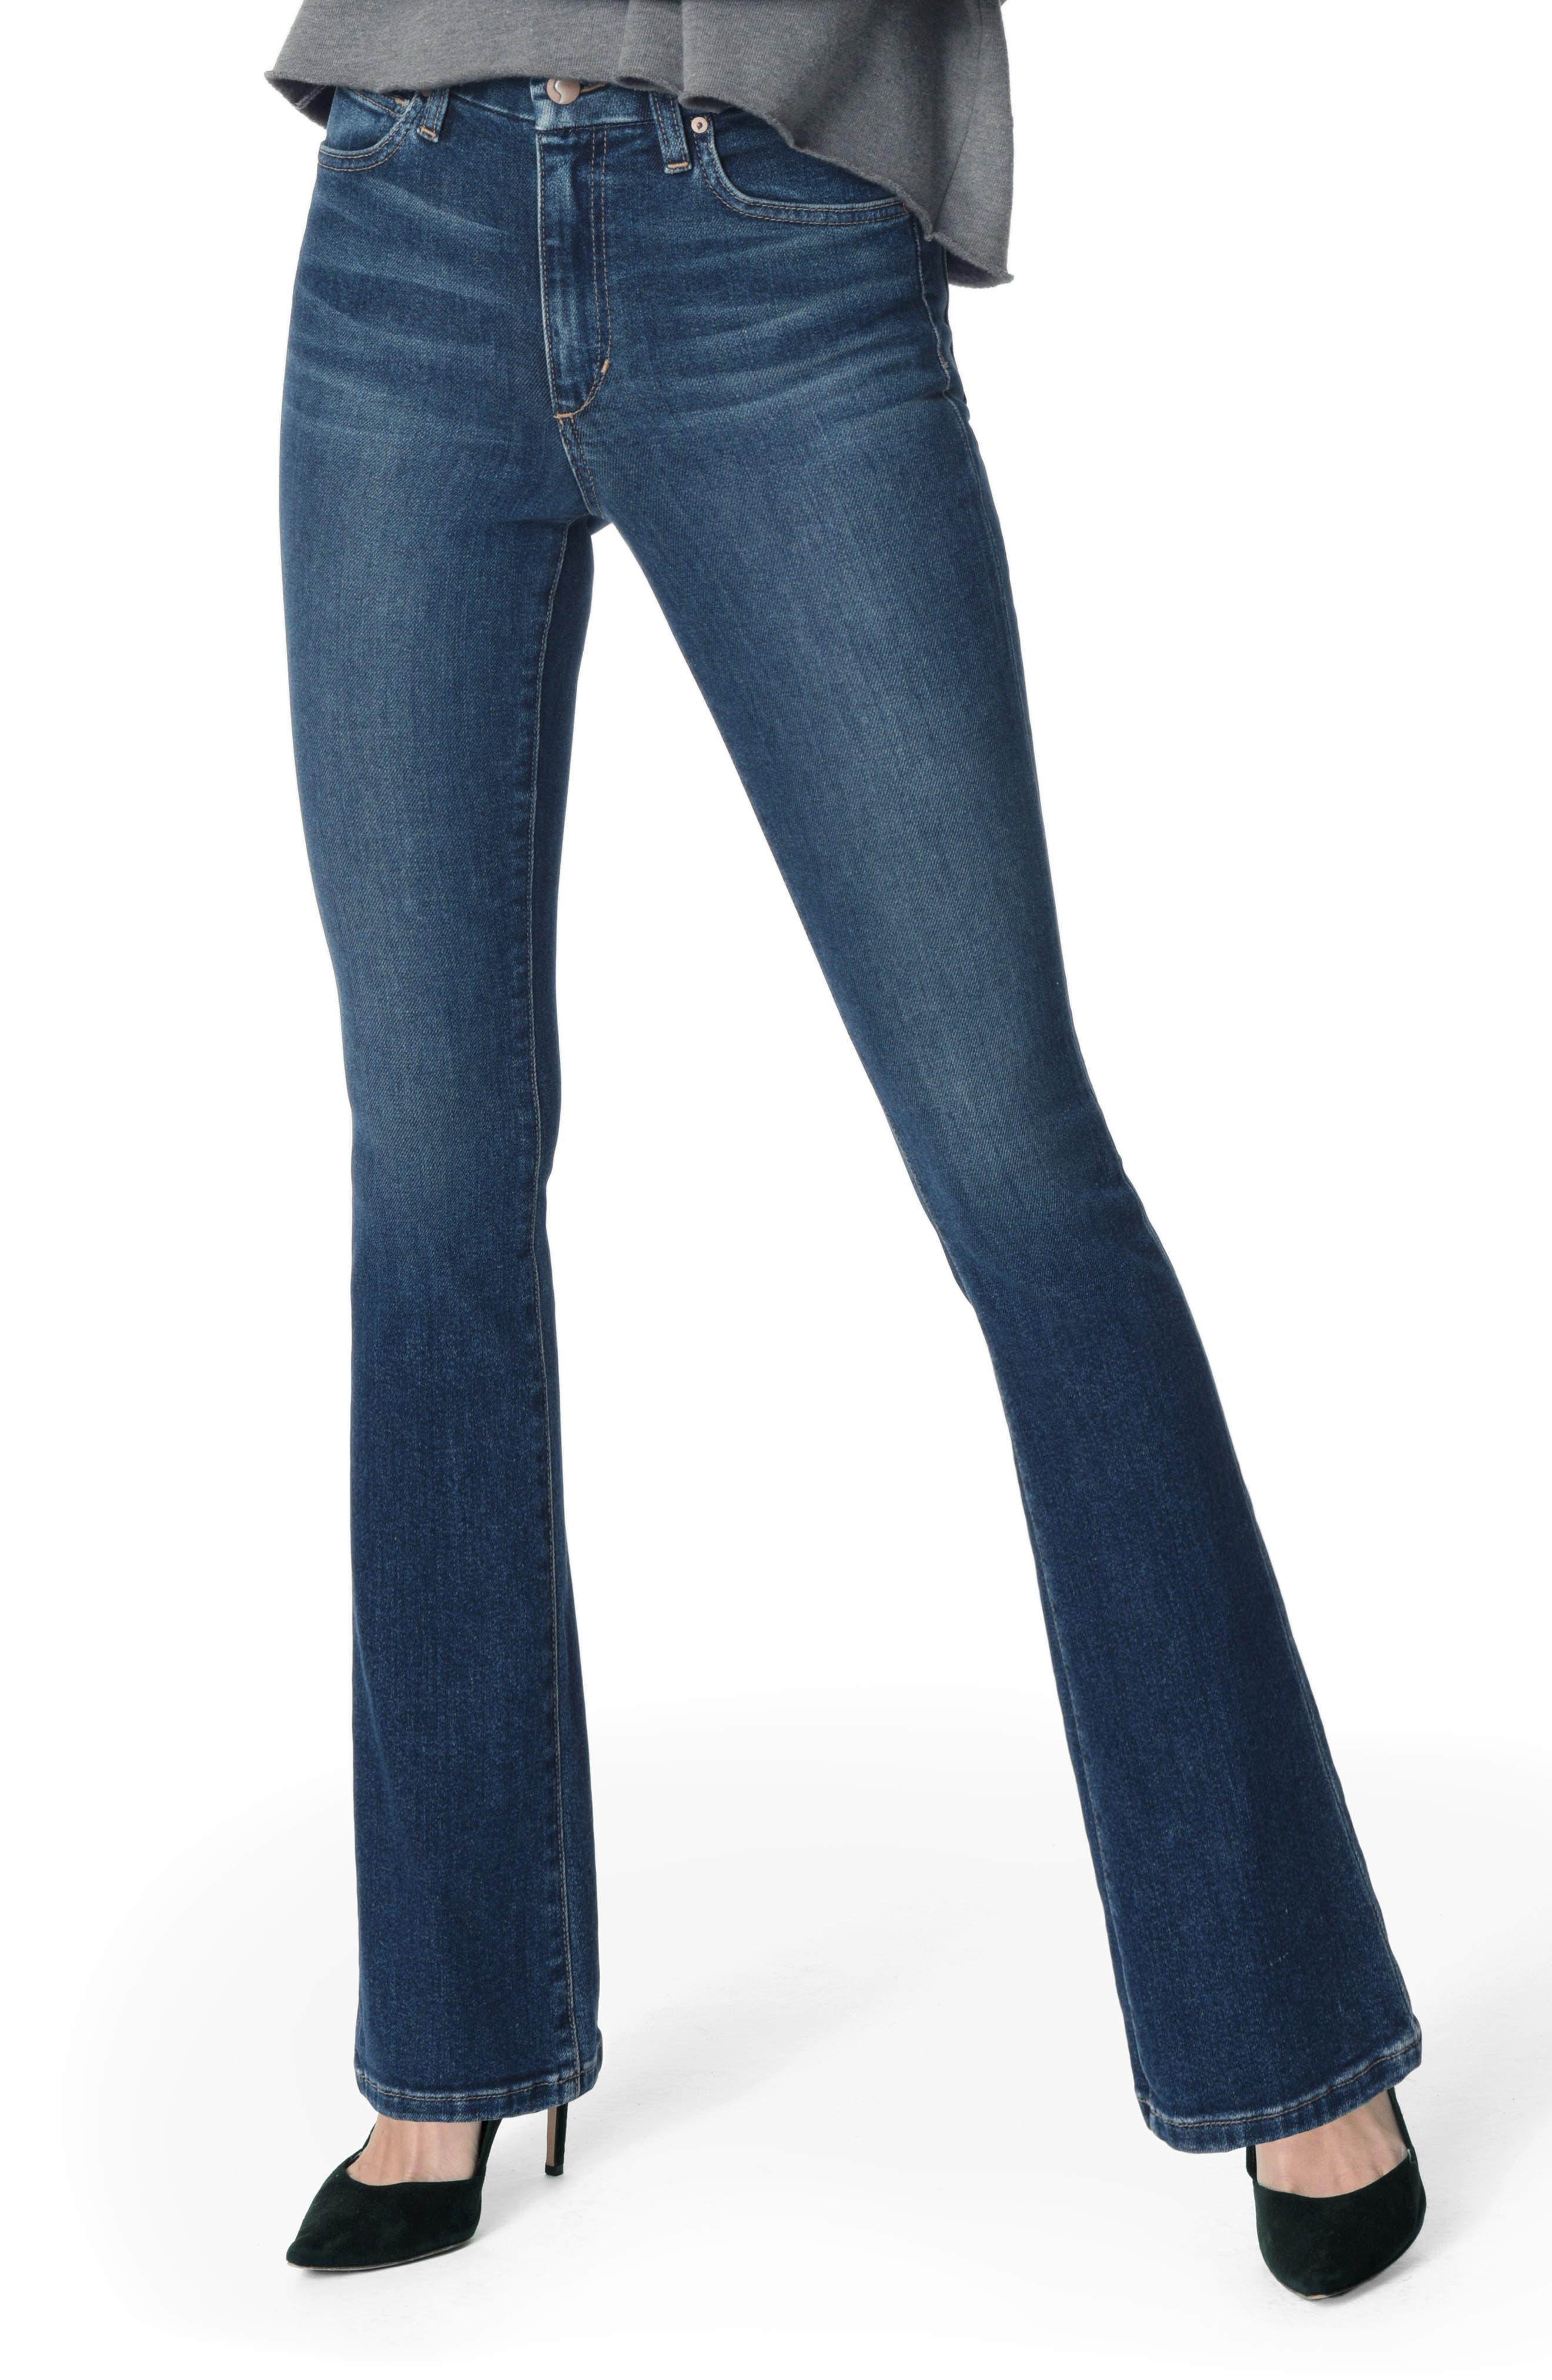 JOE'S, Honey Curvy High Waist Bootcut Jeans, Main thumbnail 1, color, 420